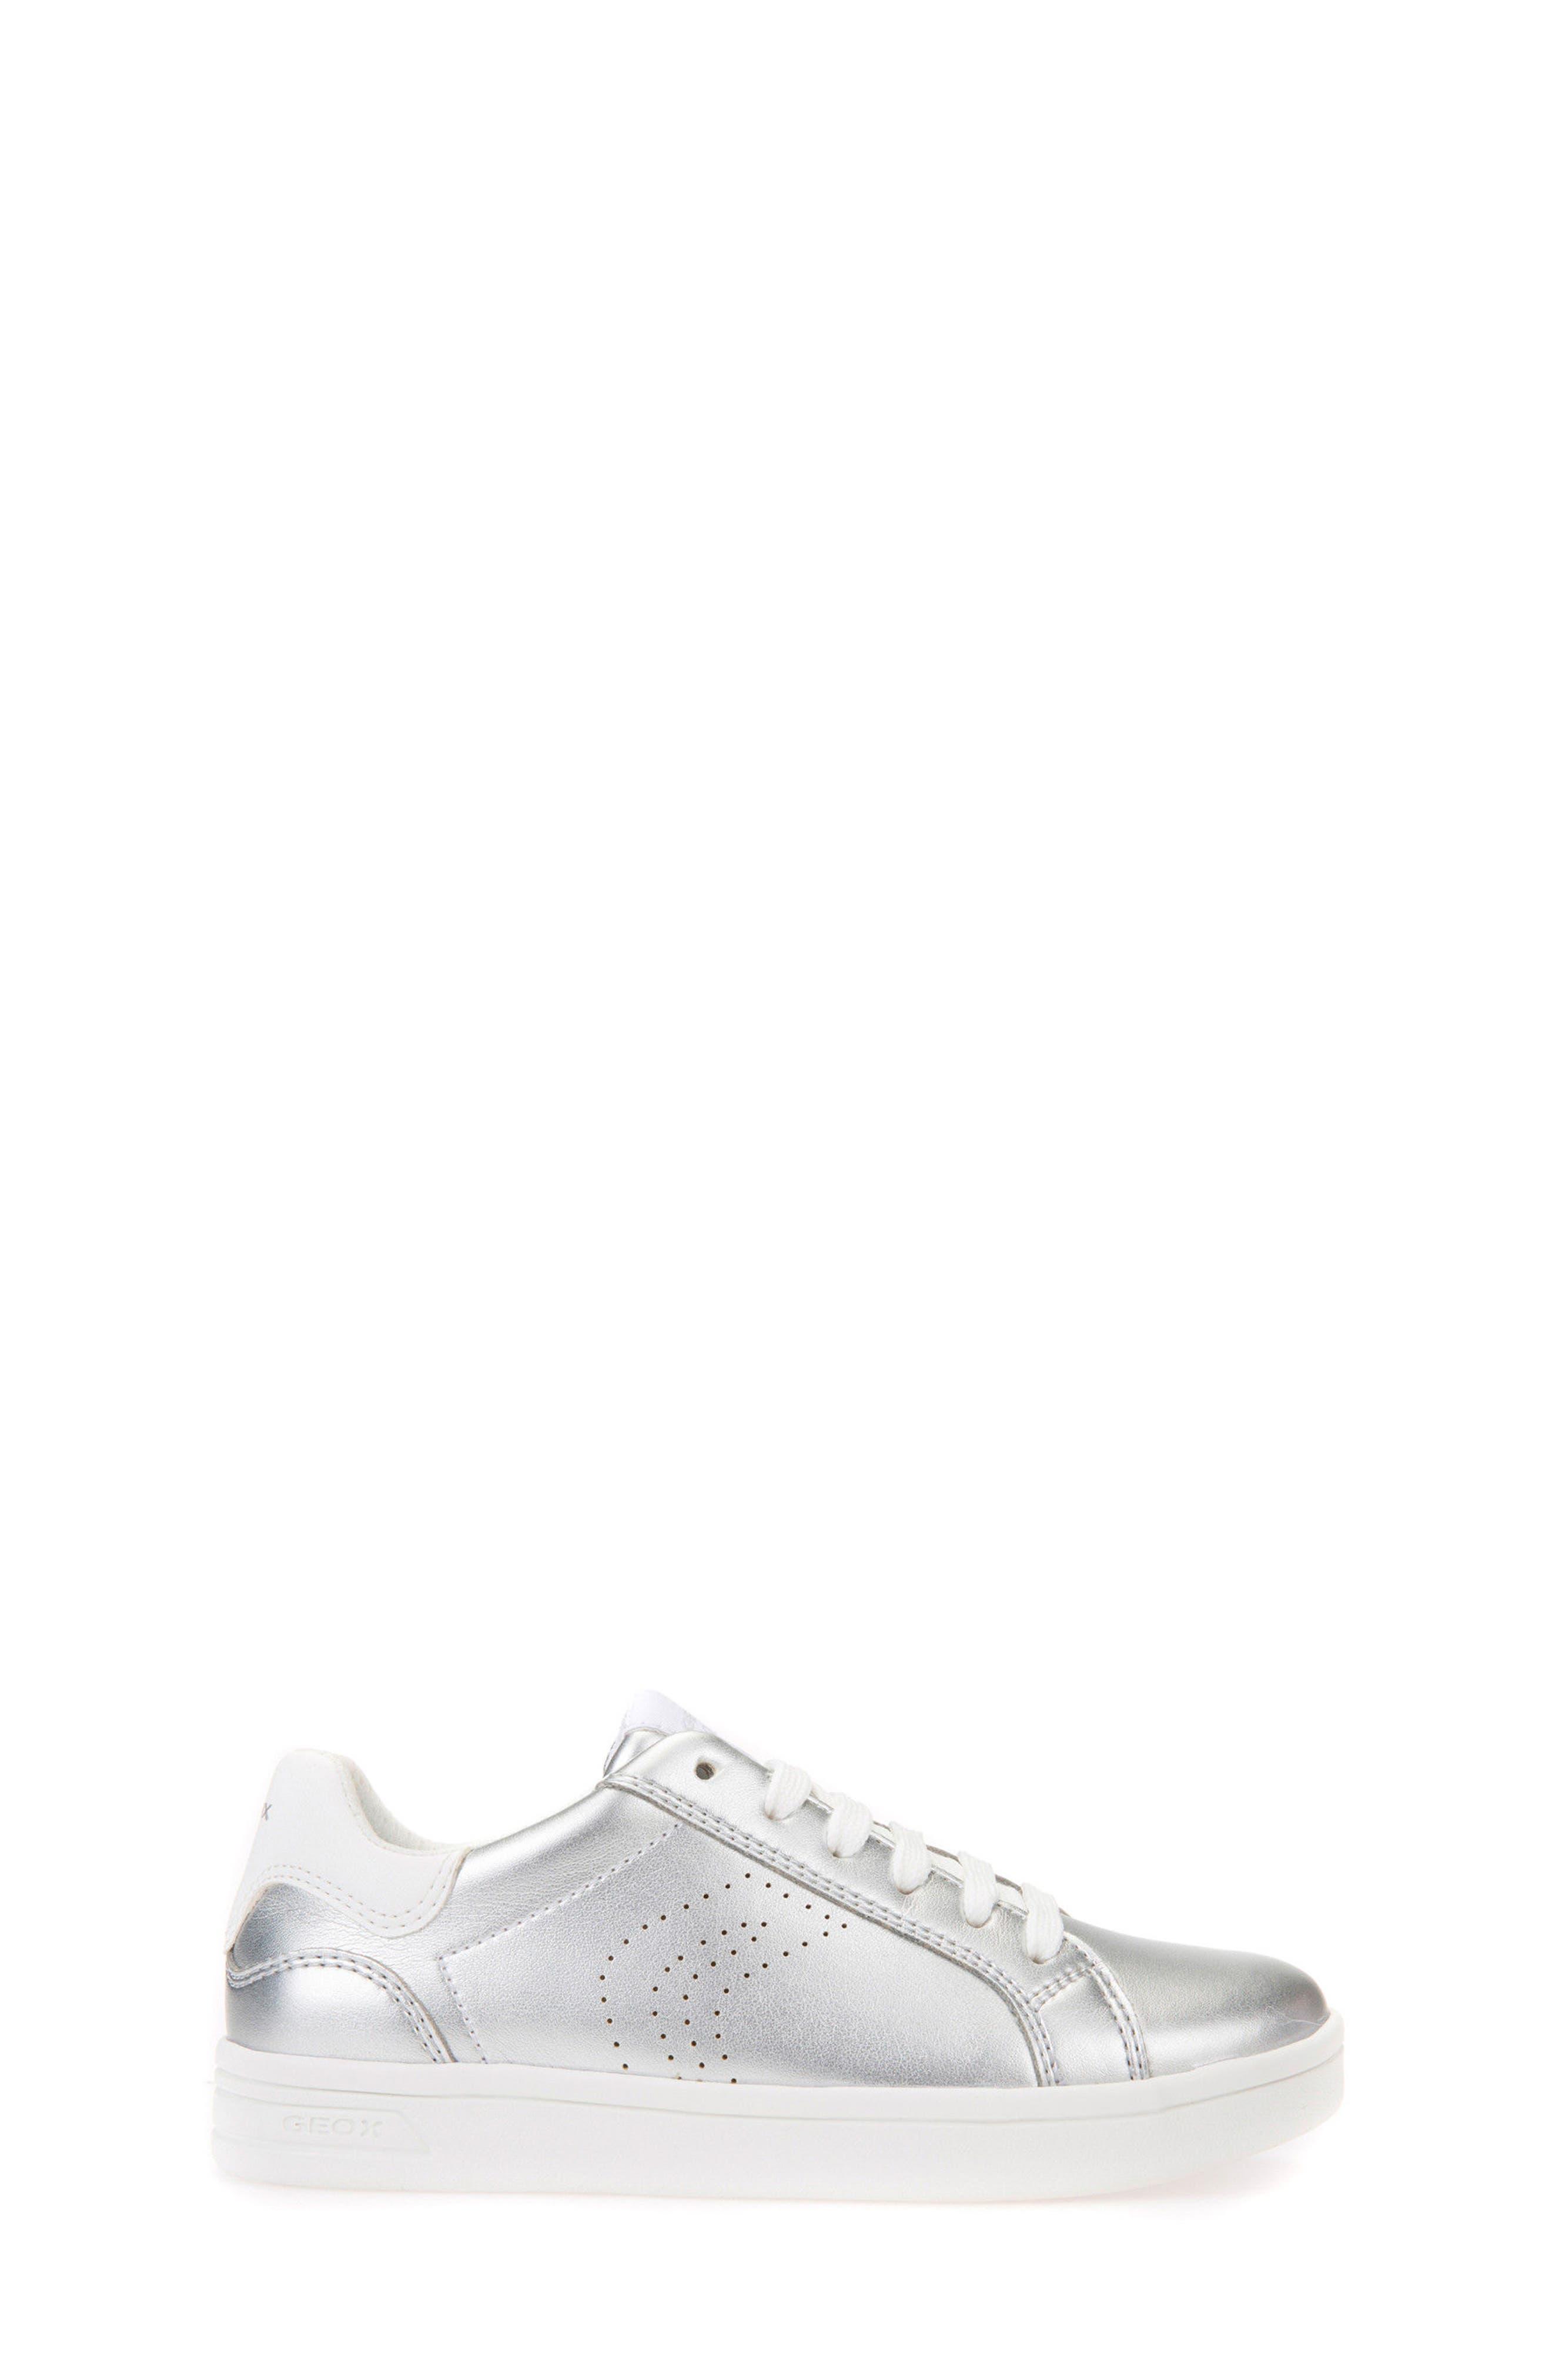 DJ Rock Metallic Low Top Sneaker,                             Alternate thumbnail 3, color,                             Silver